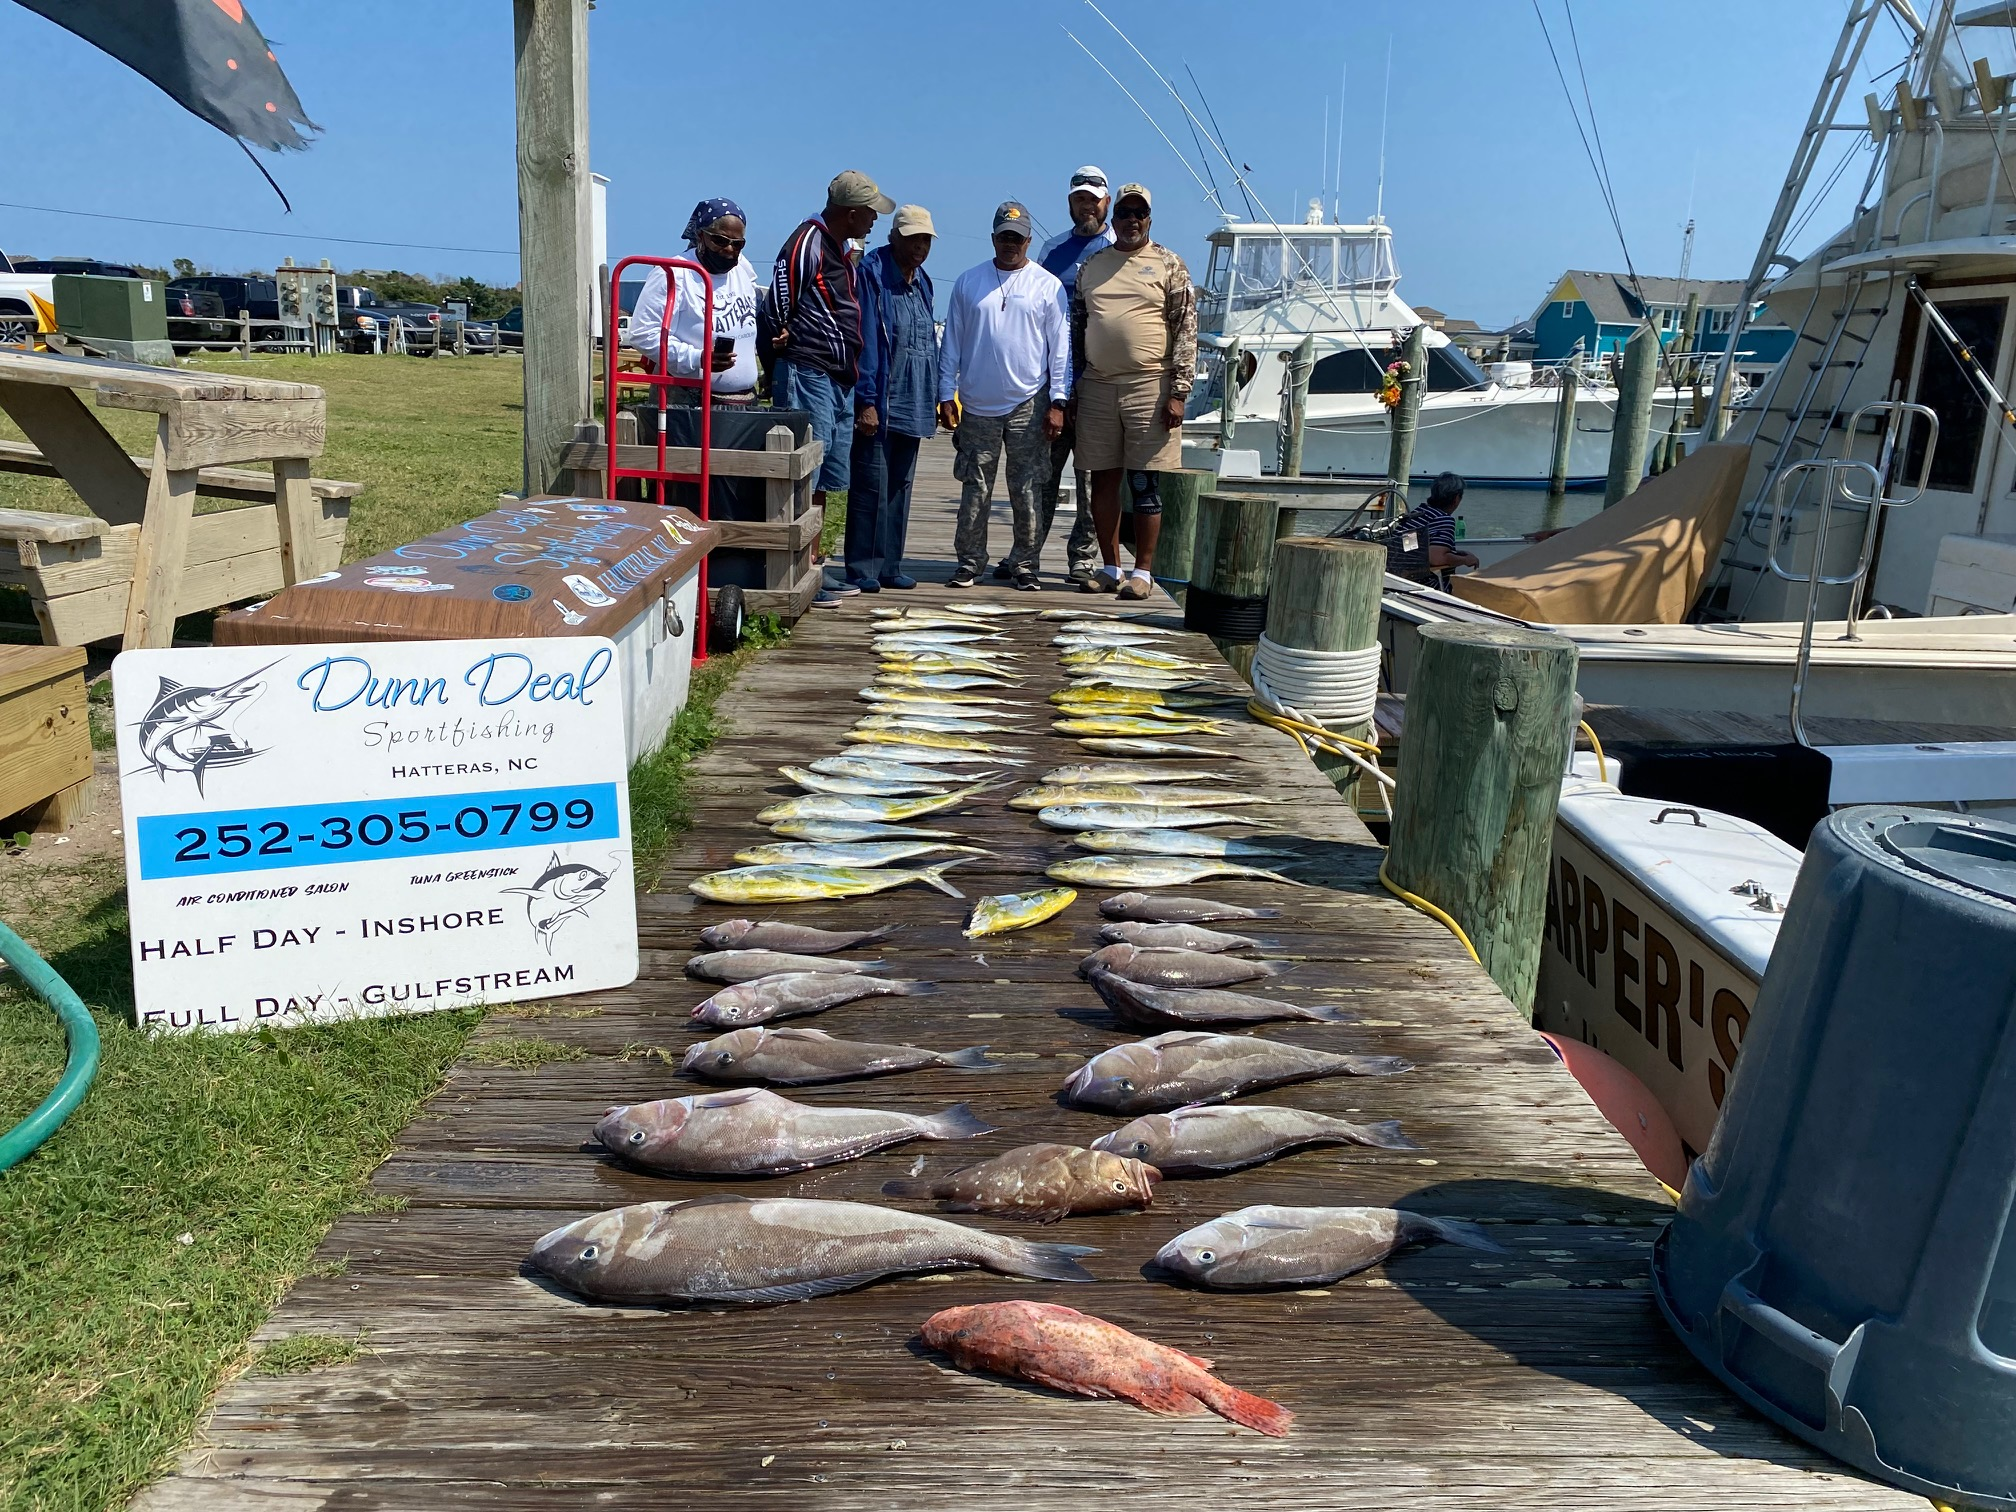 Dunn Deal Sportfishing Charters Hatteras, NC Teach's Lair Marina